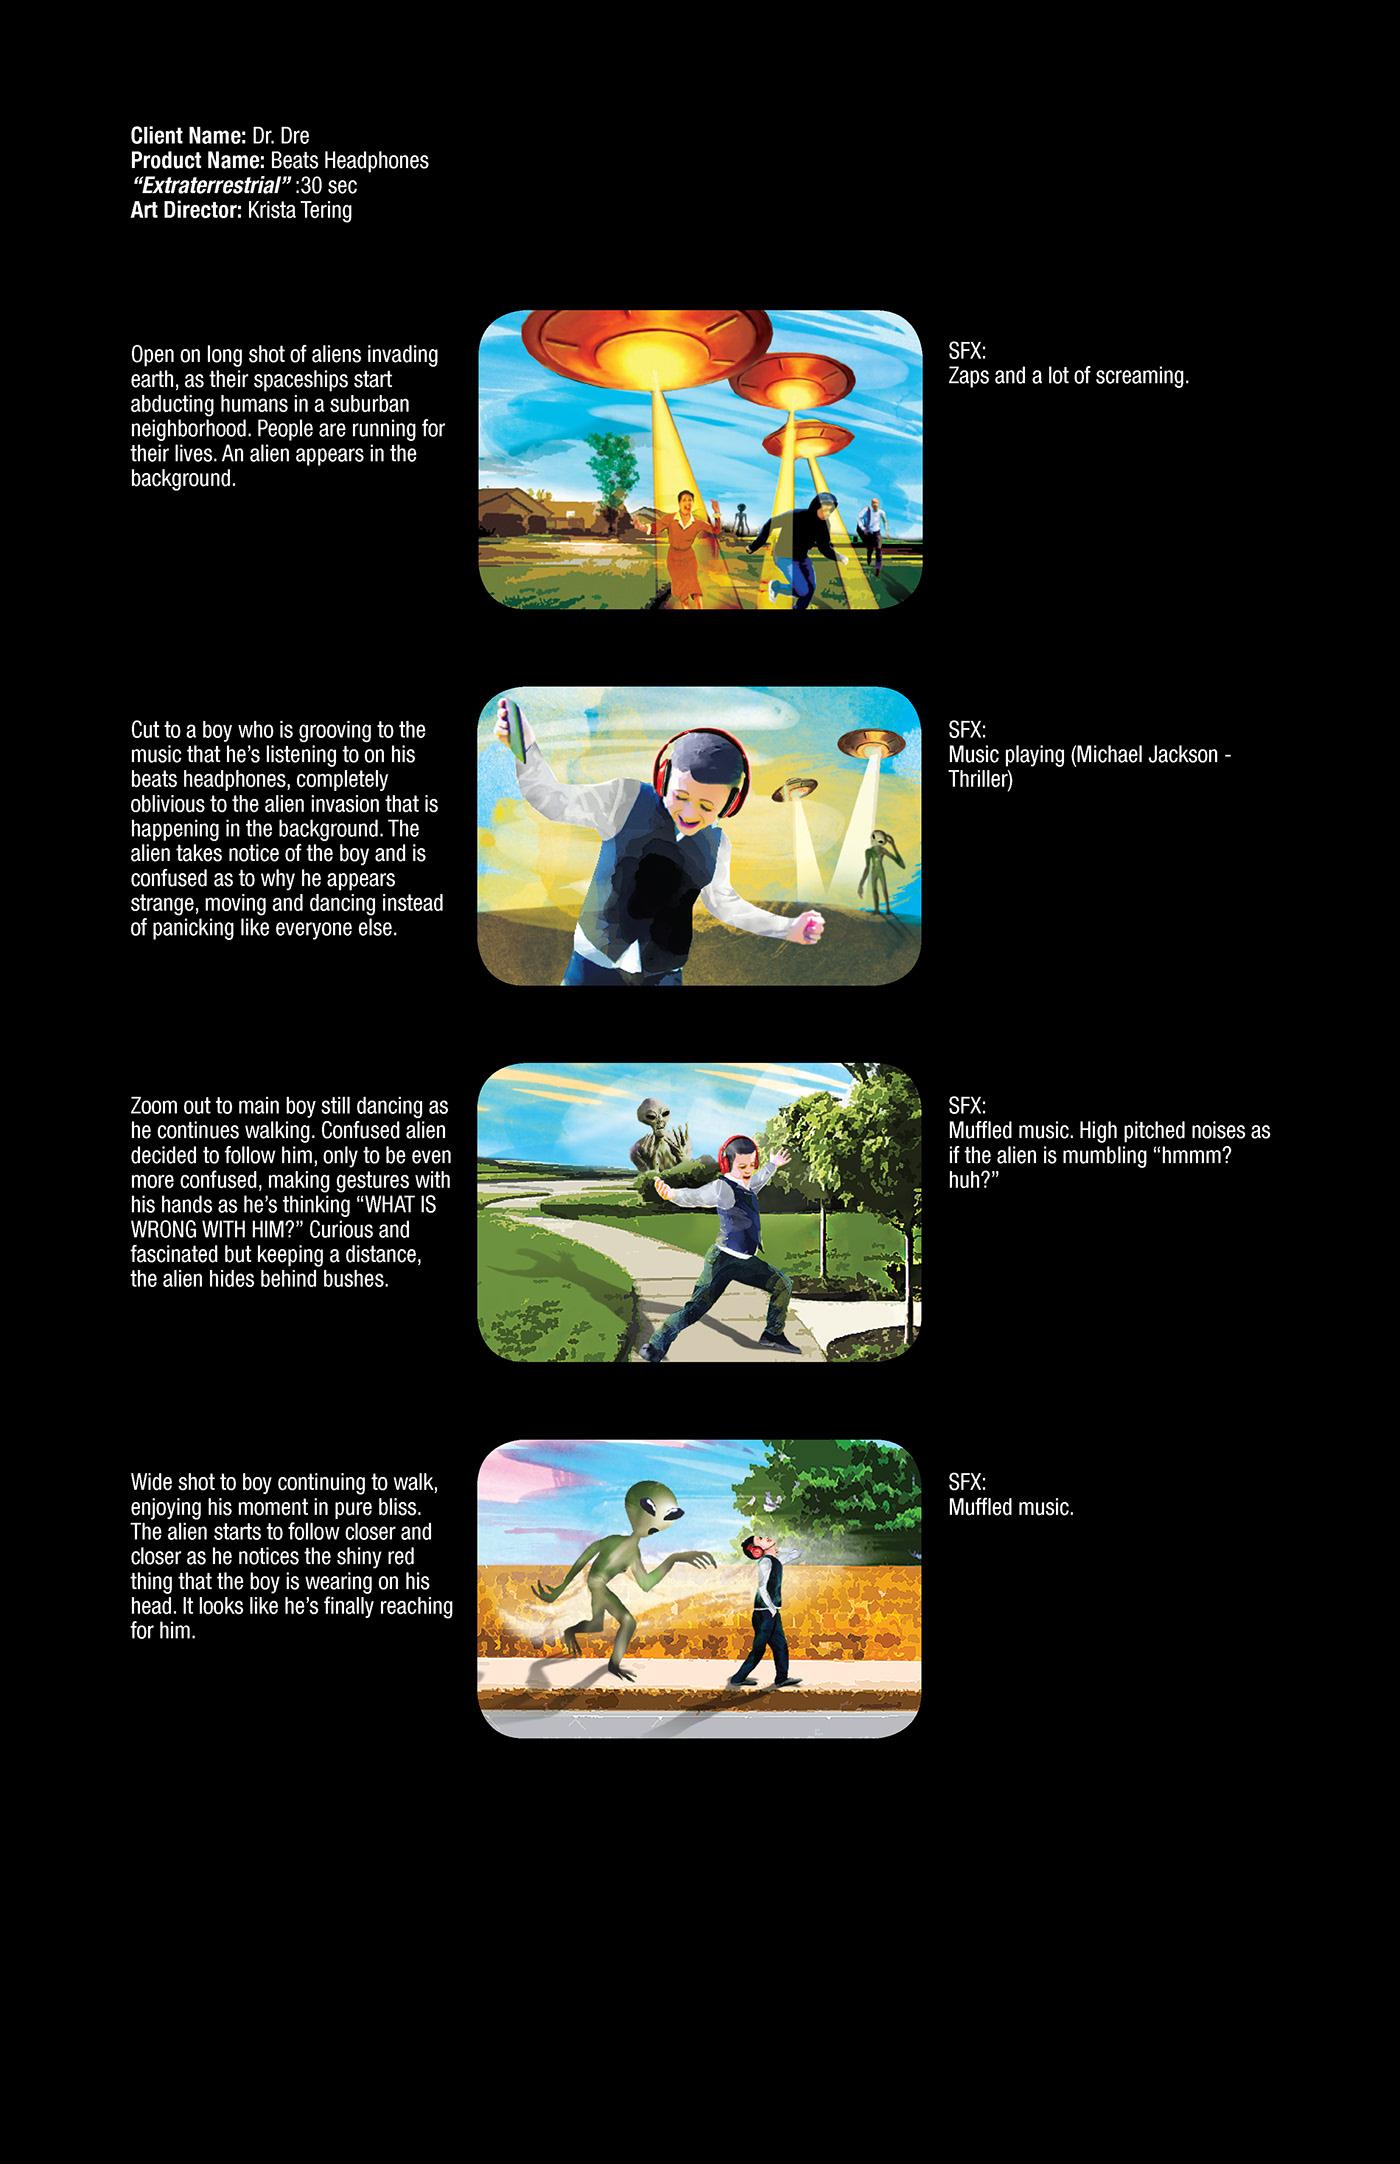 Advertising  advertising design commercial Digital Art  ILLUSTRATION  art direction